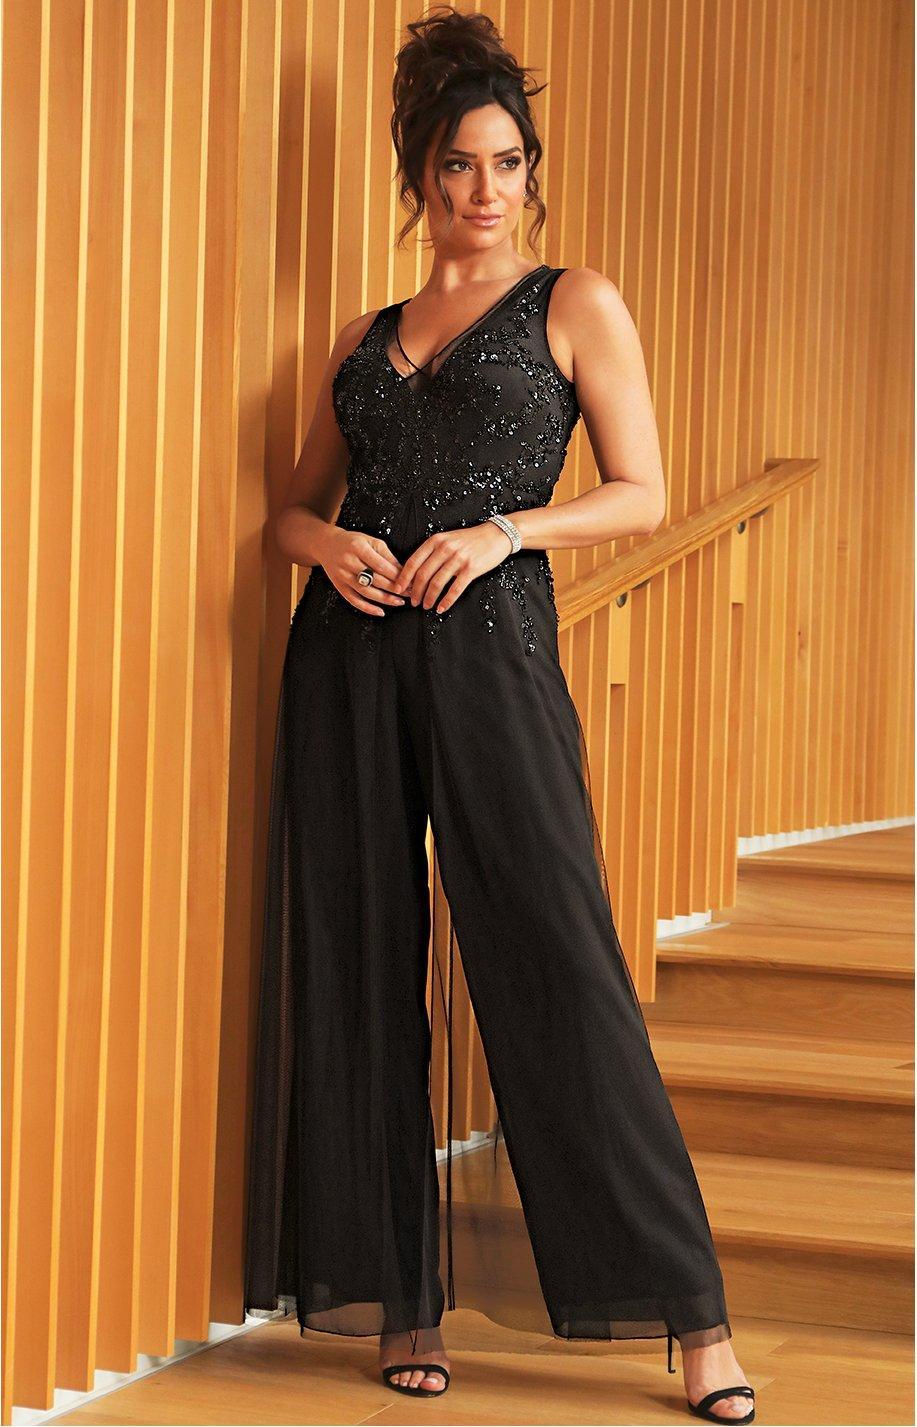 model wearing black jumpsuit with sequin embellished top